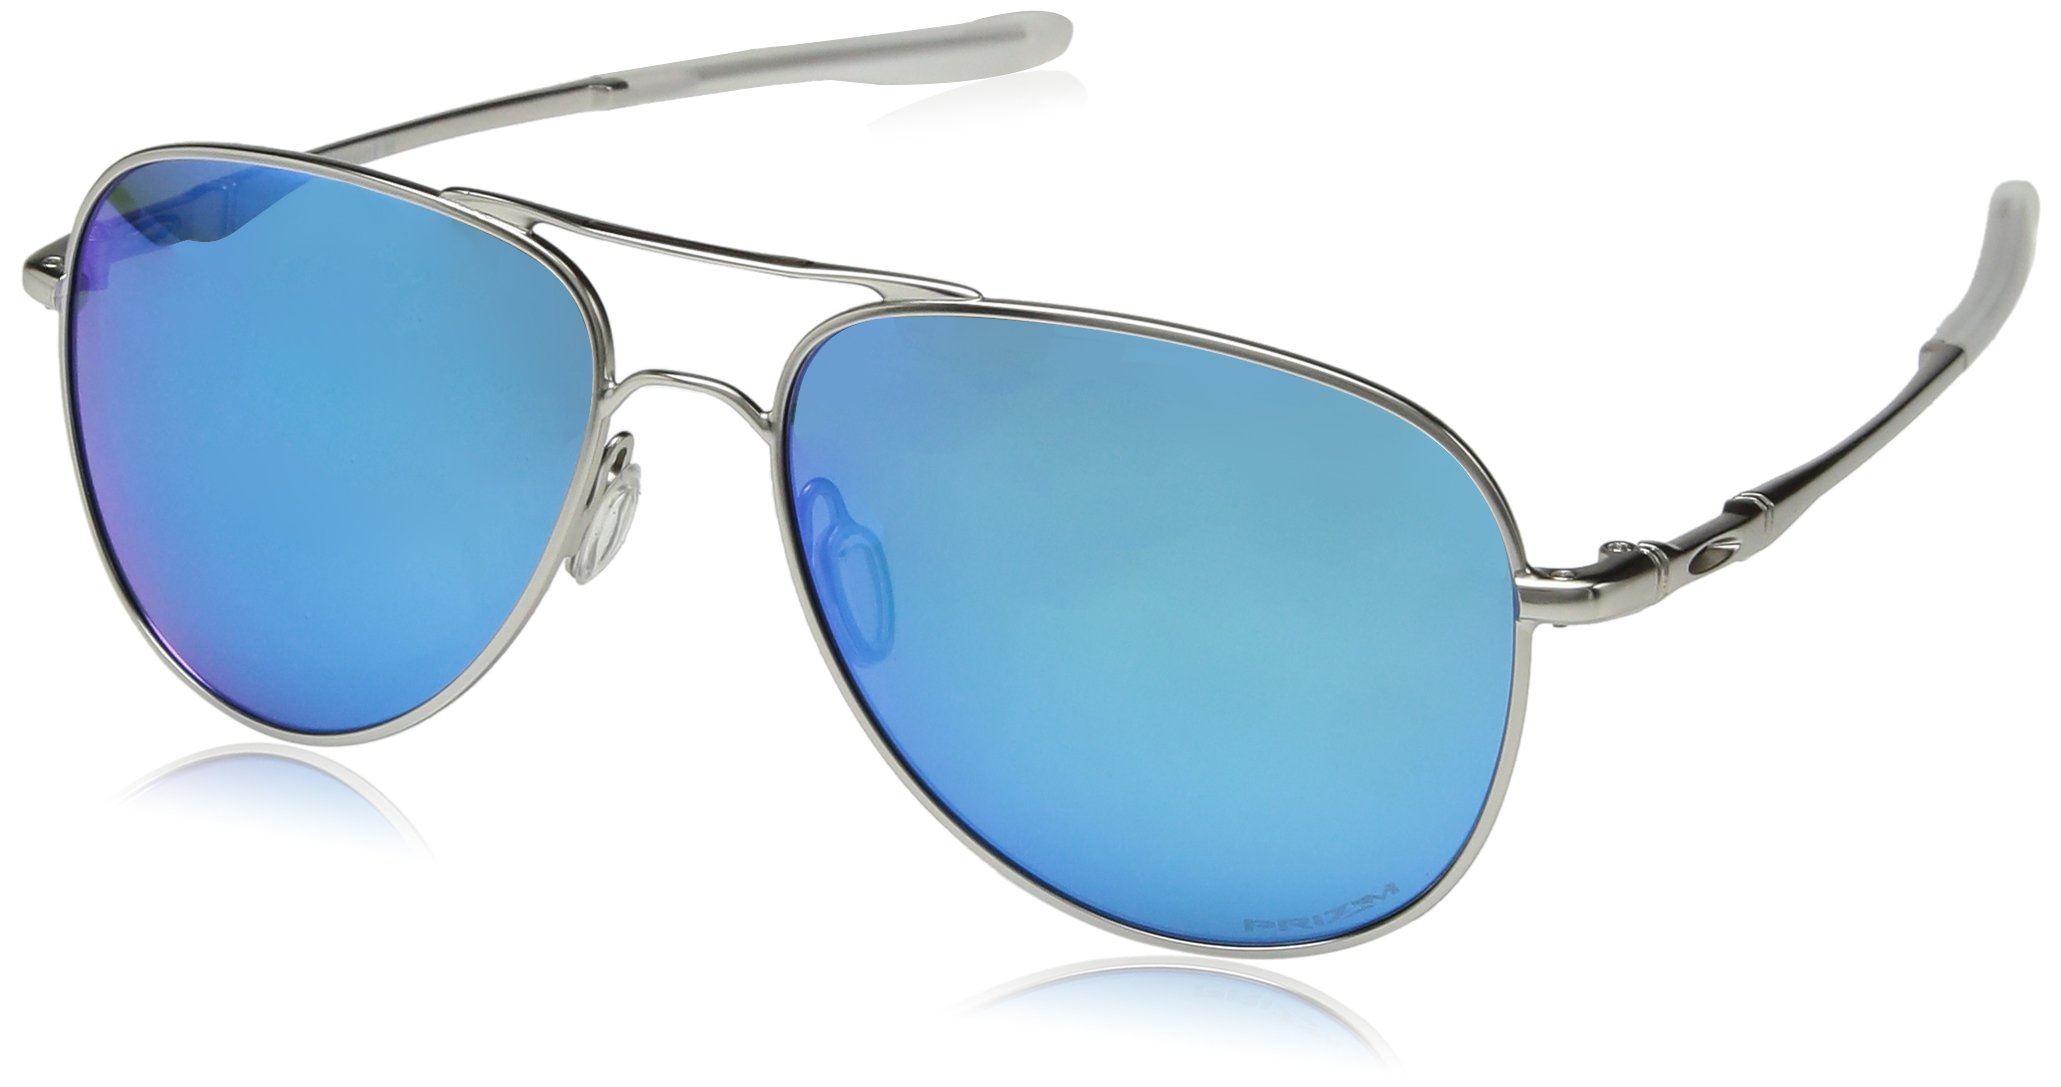 Oakley Elmont Polarized Round Sunglasses, Satin Chrome, 58.0 mm